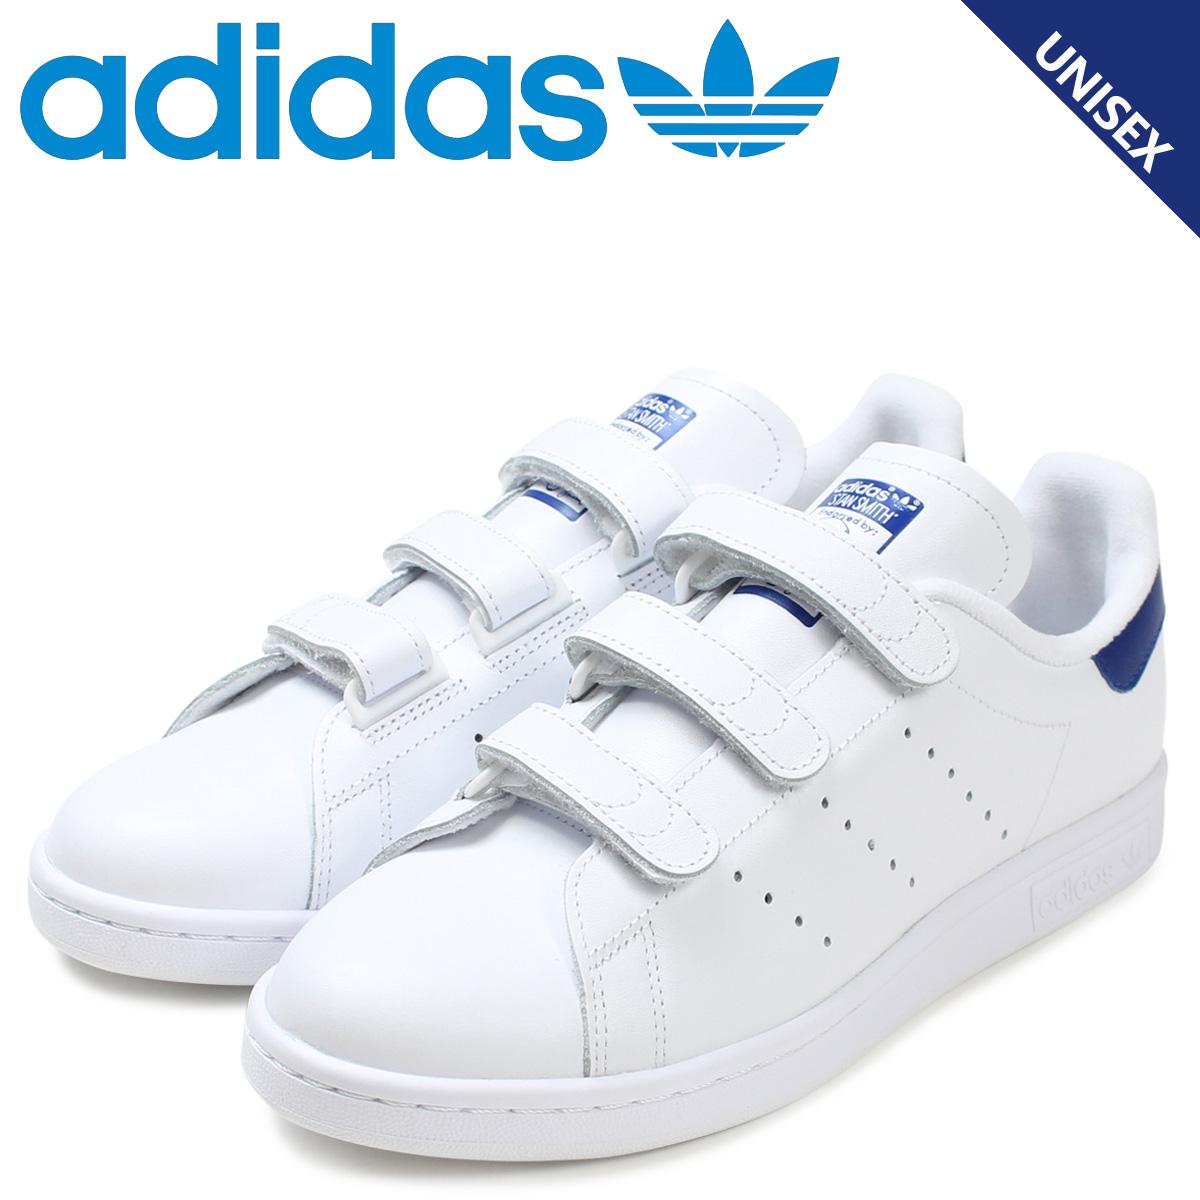 adidas stan smith women shoes